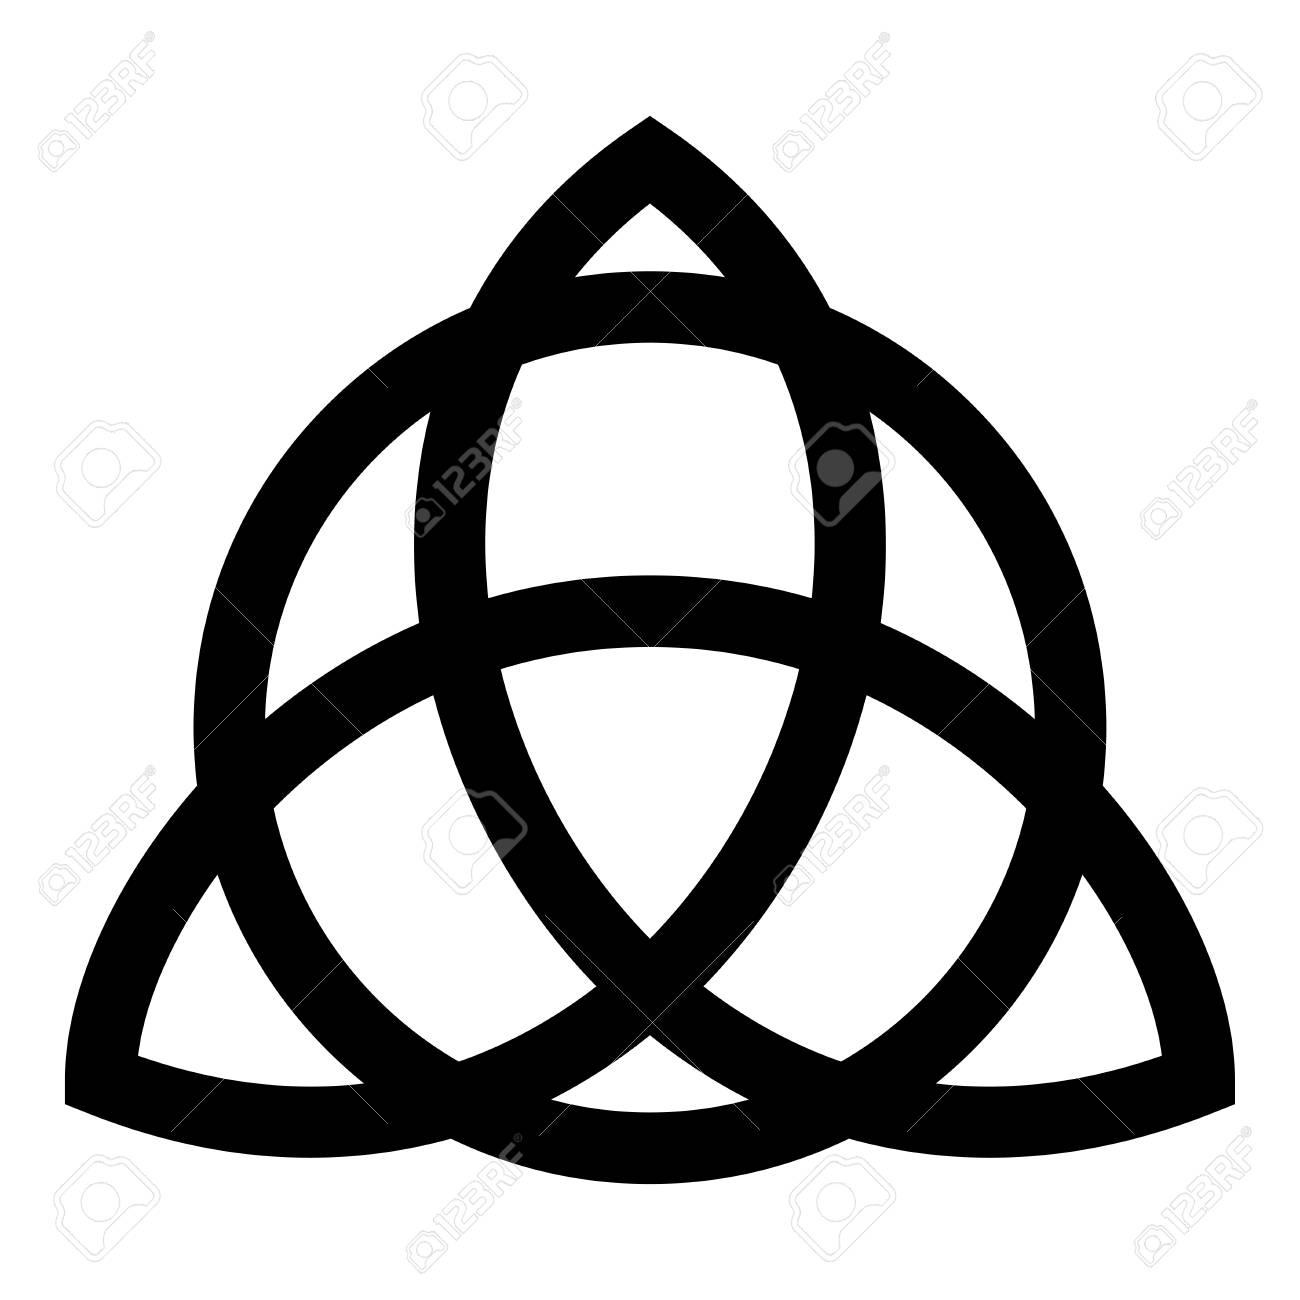 Trikvetr Knot With Circle Power Of Three Viking Symbol Tribal